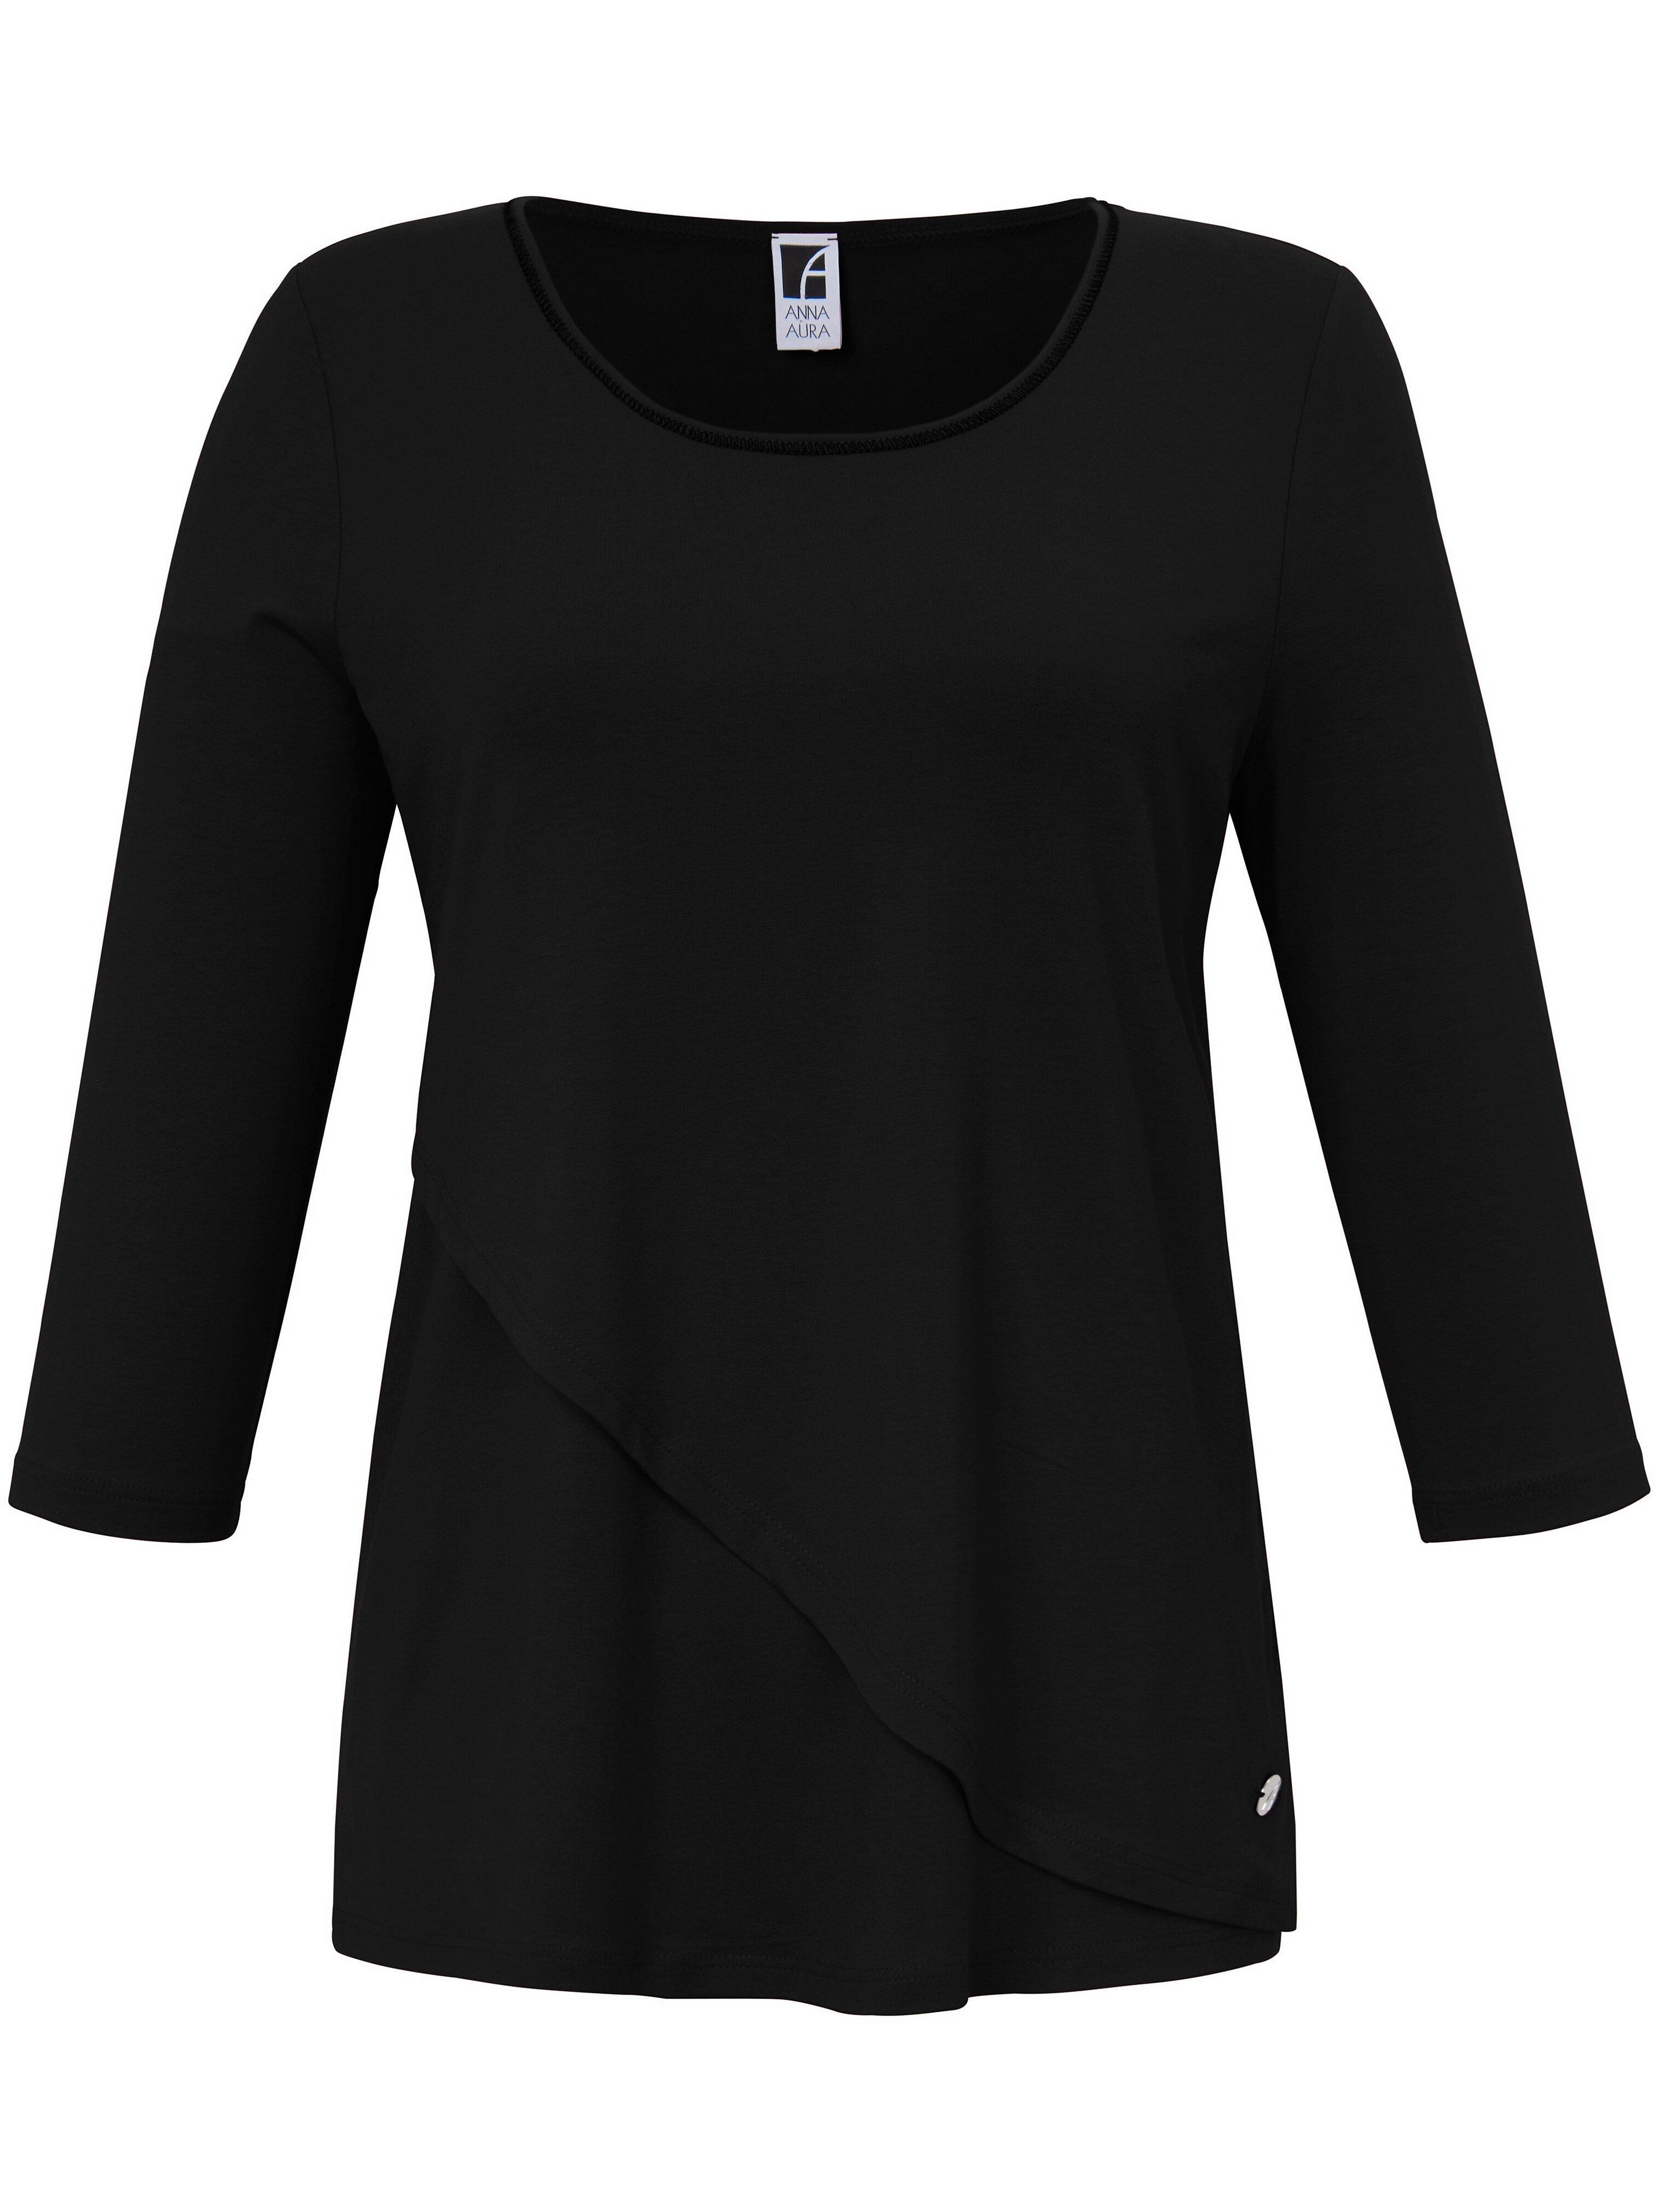 Round neck top 3/4-length sleeves Anna Aura black